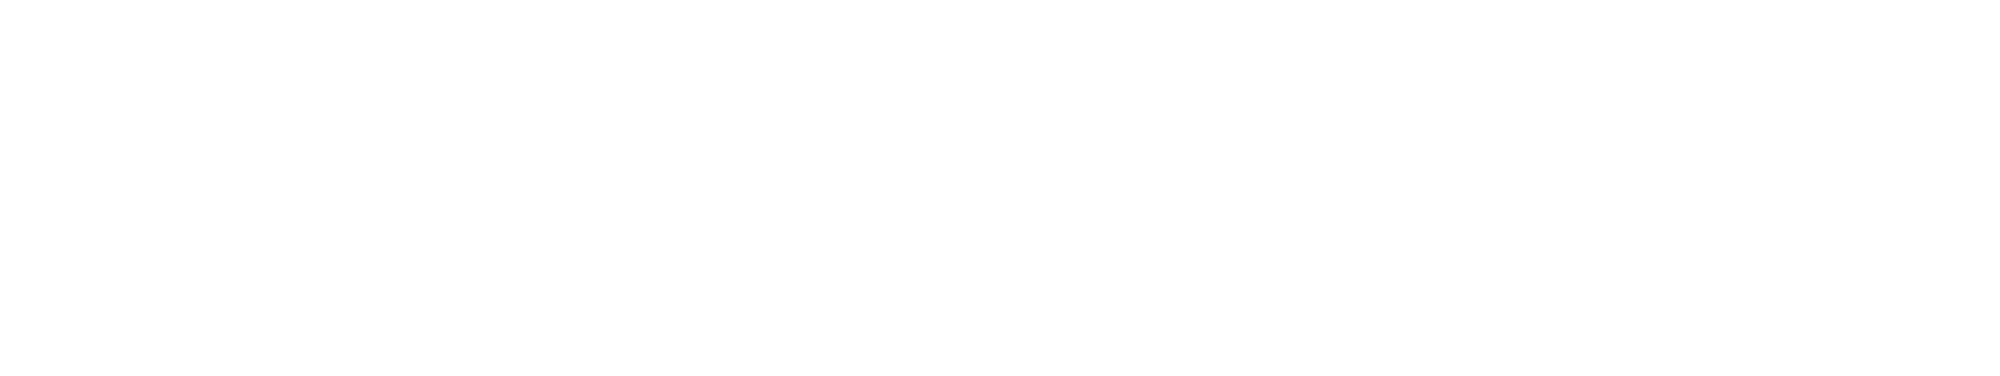 Bucks County Orthodontics curve image